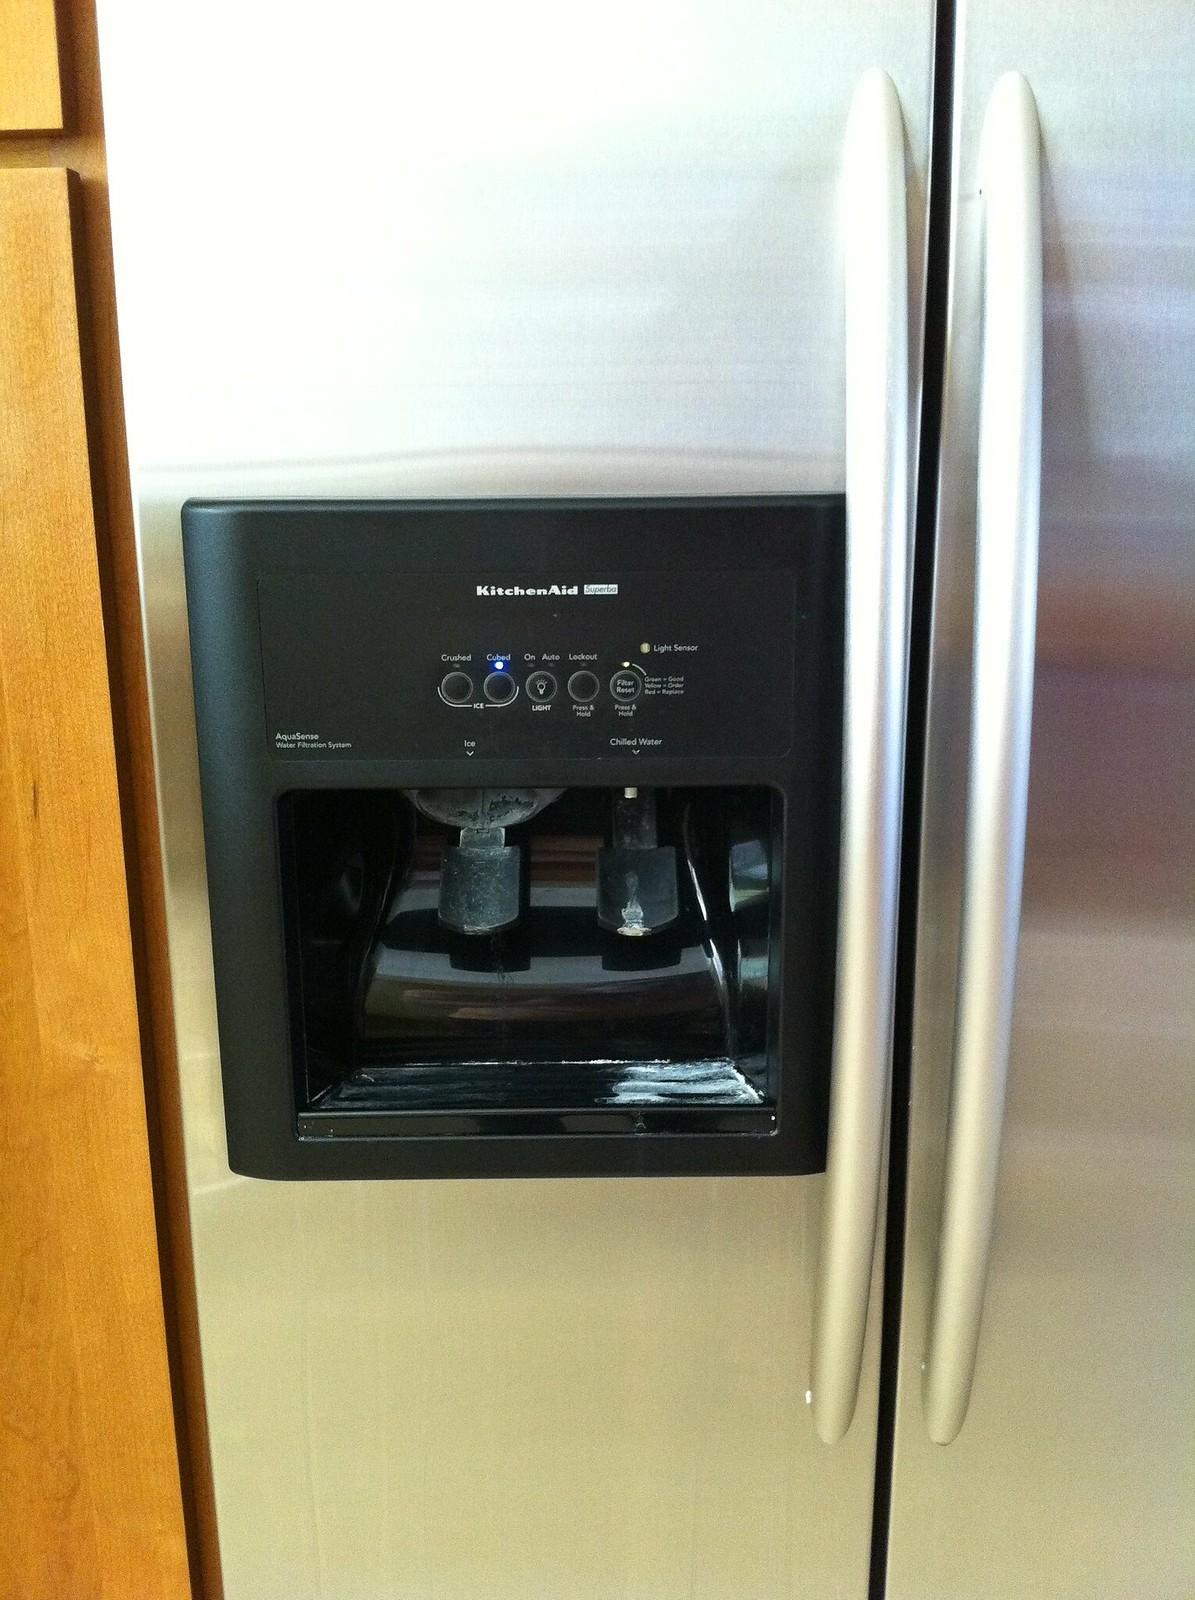 Ice dispenser!